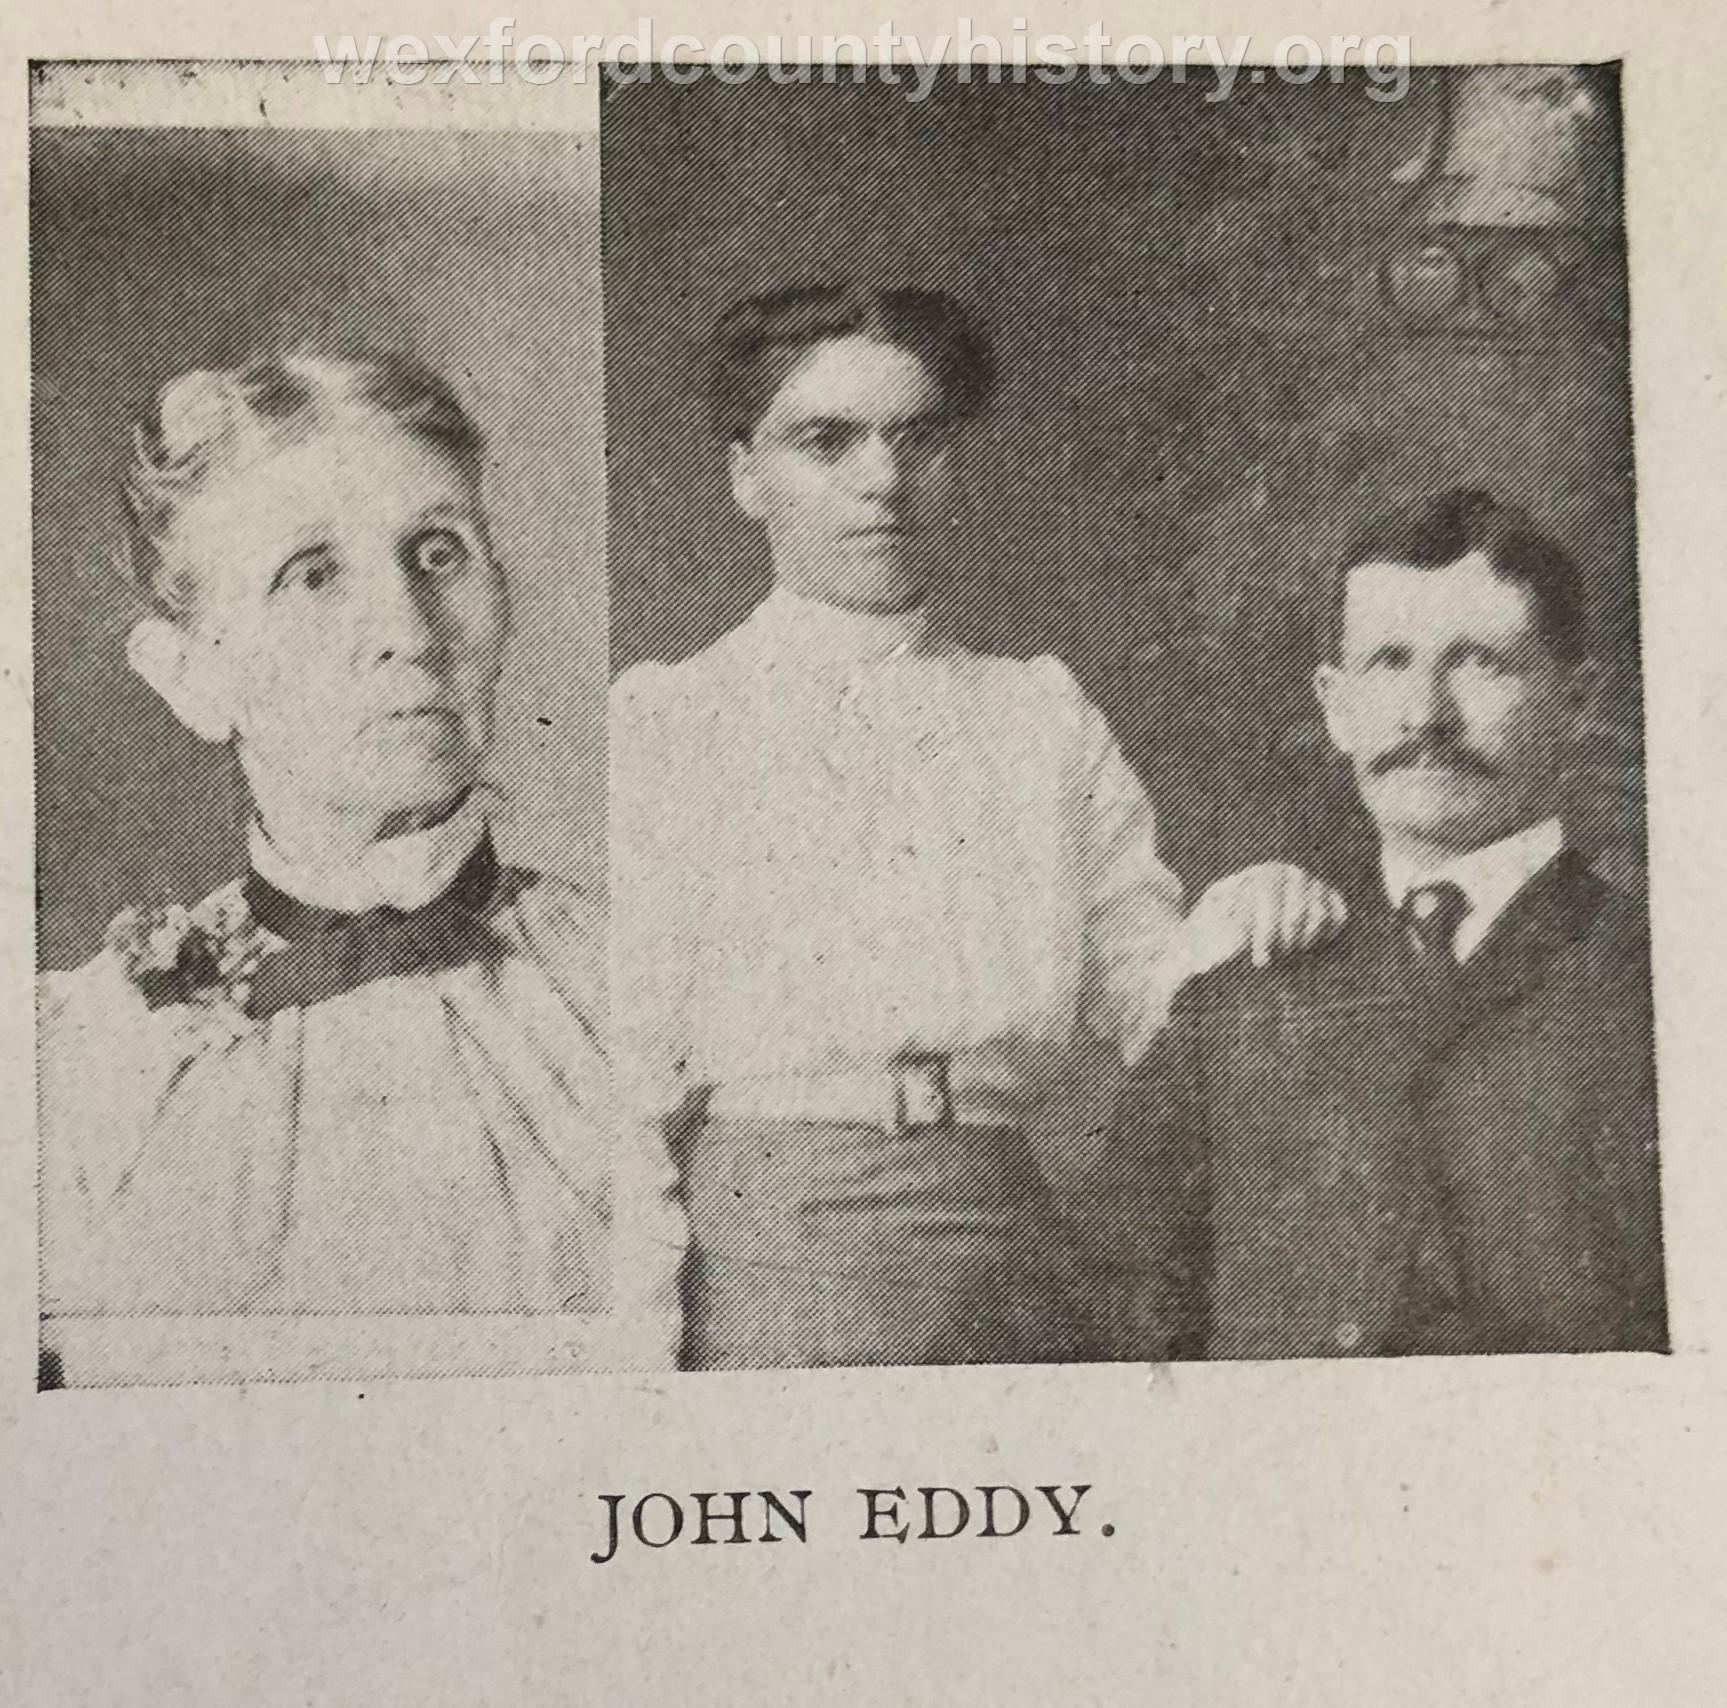 John Eddy